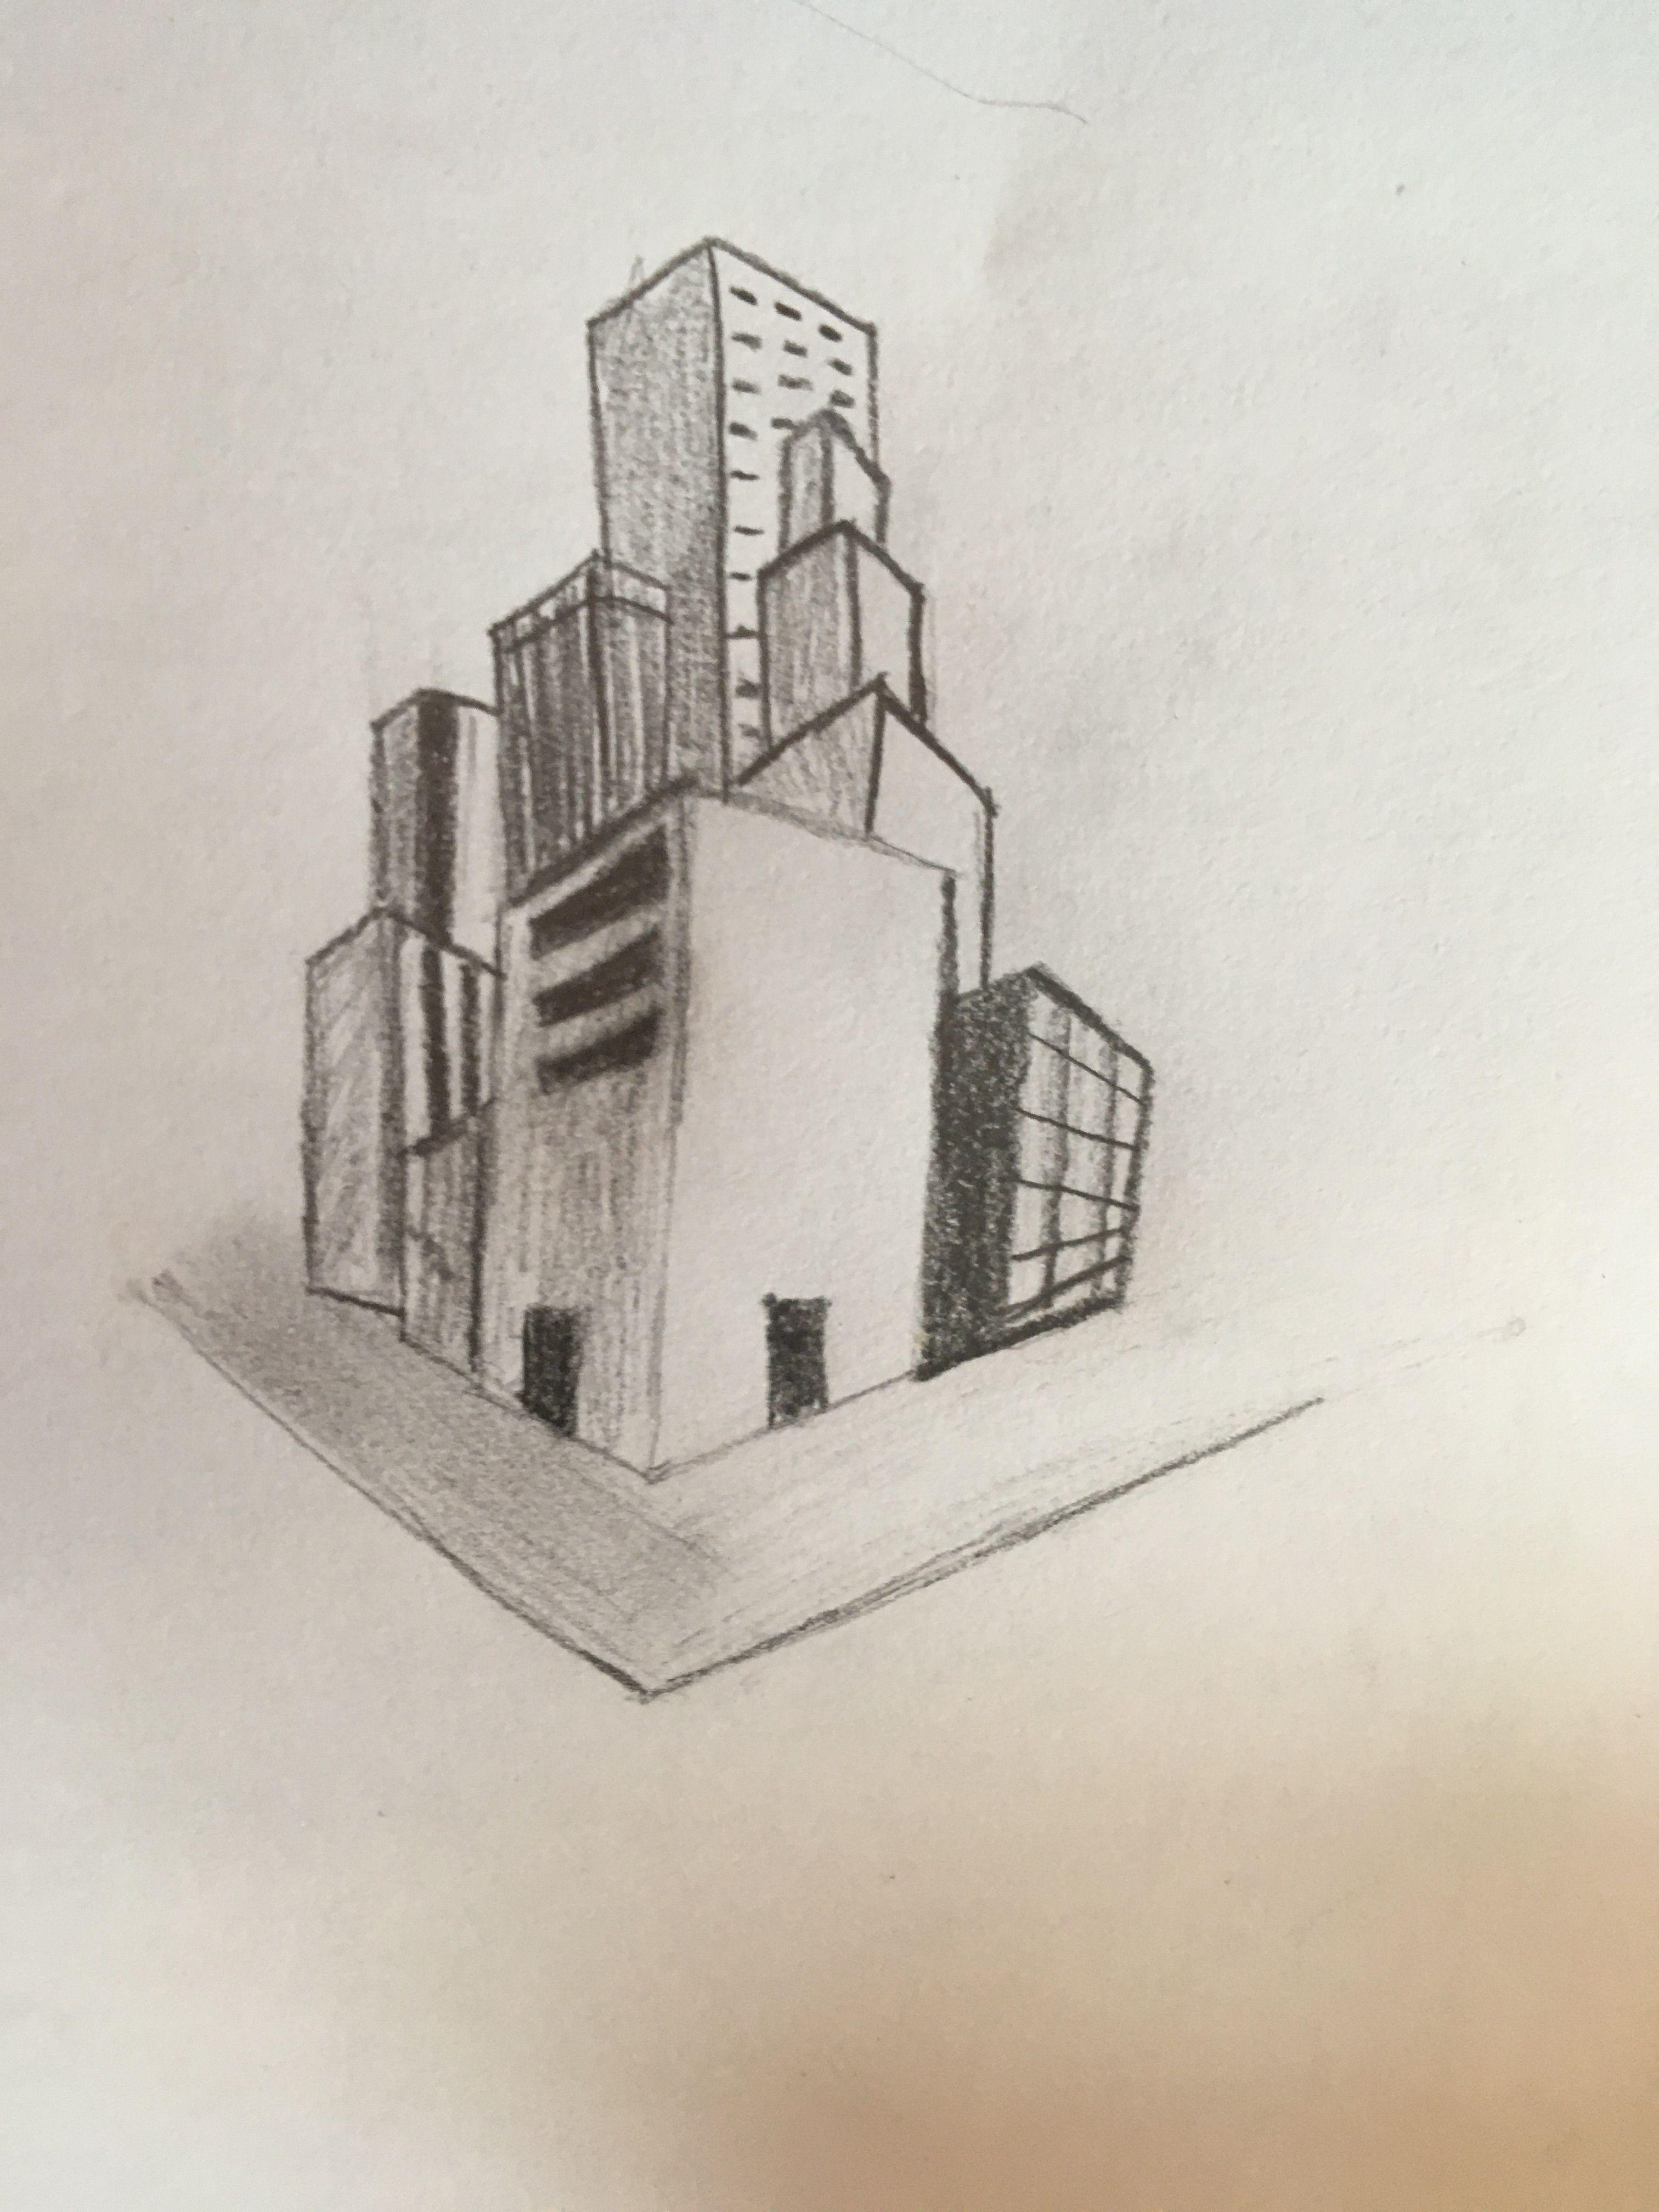 Pin De Joel Santos En Ezdrawings Dibujos 3d A Lapiz Dibujos 3d Dibujos